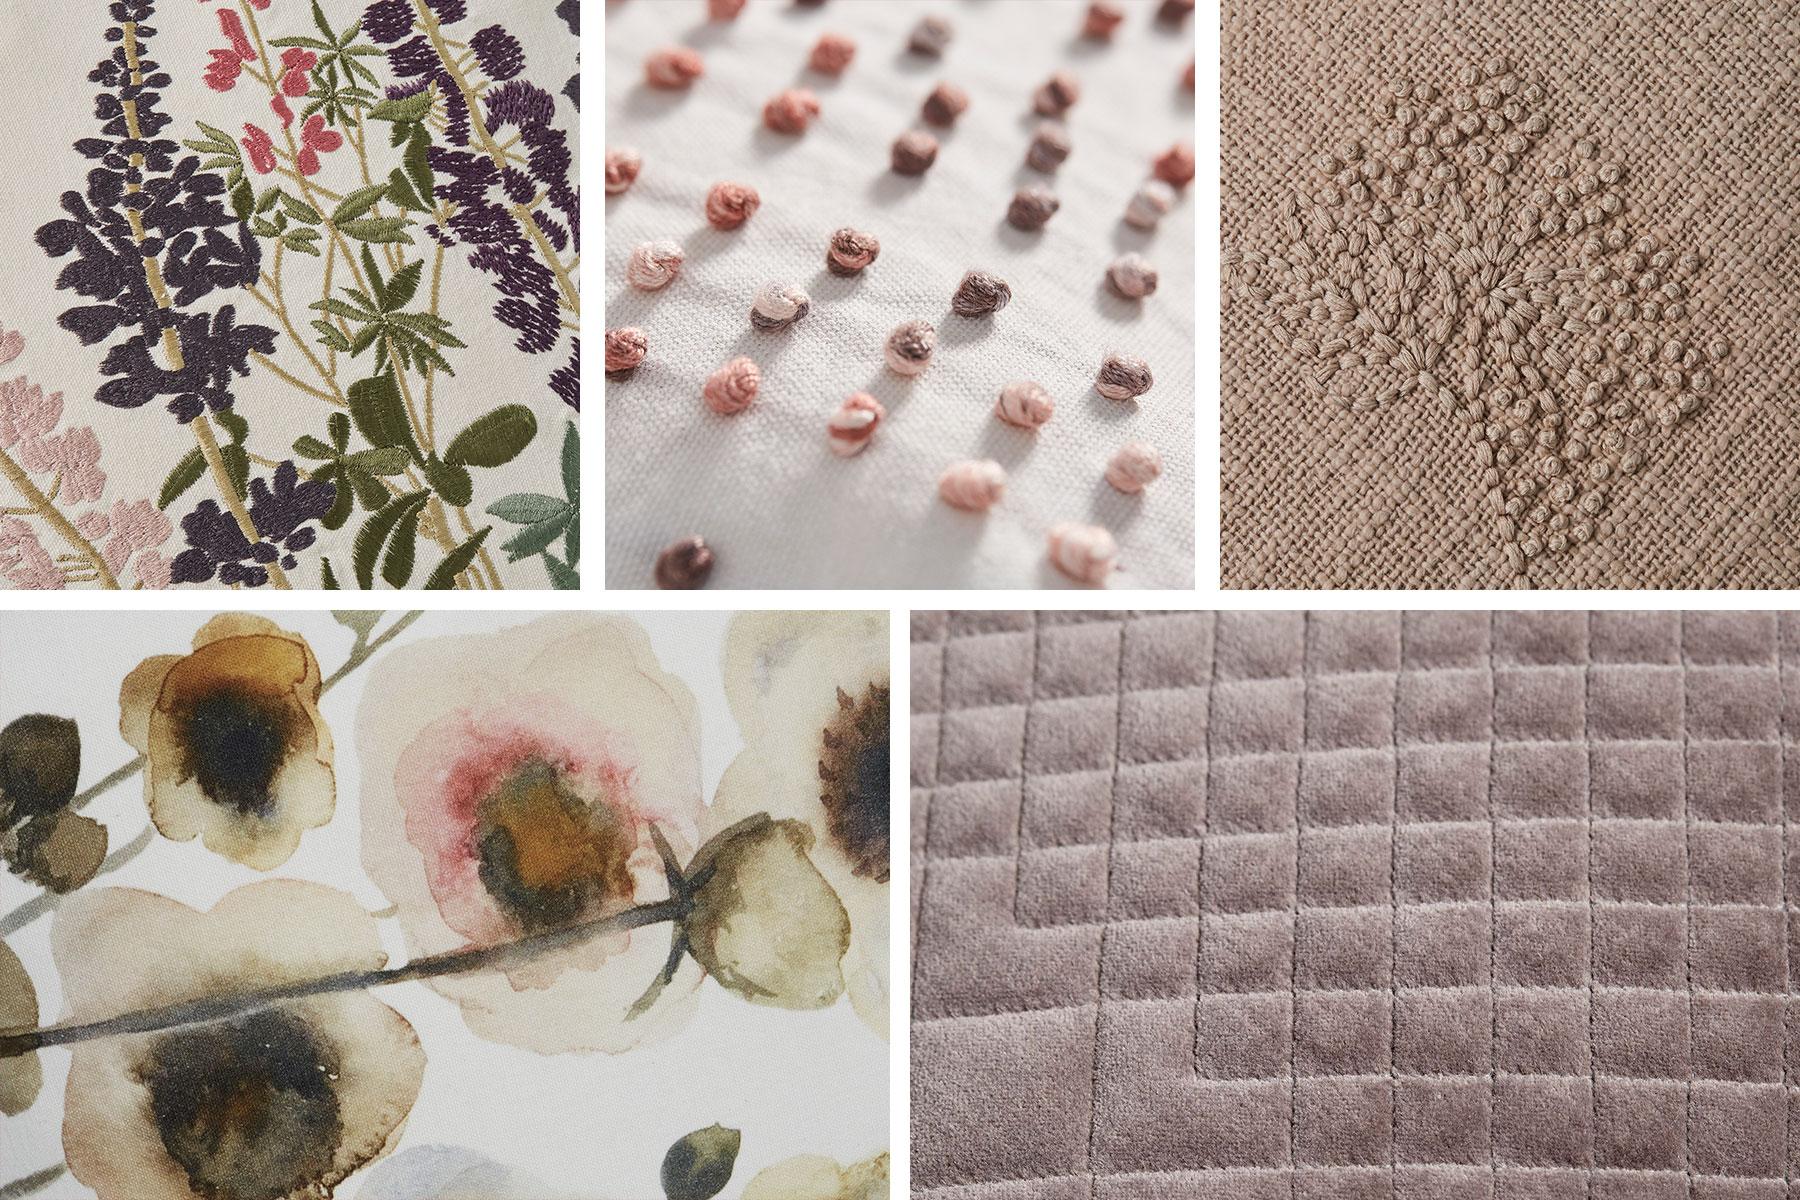 Patterns of scandinavian wholesale cushions - Lene Bjerre